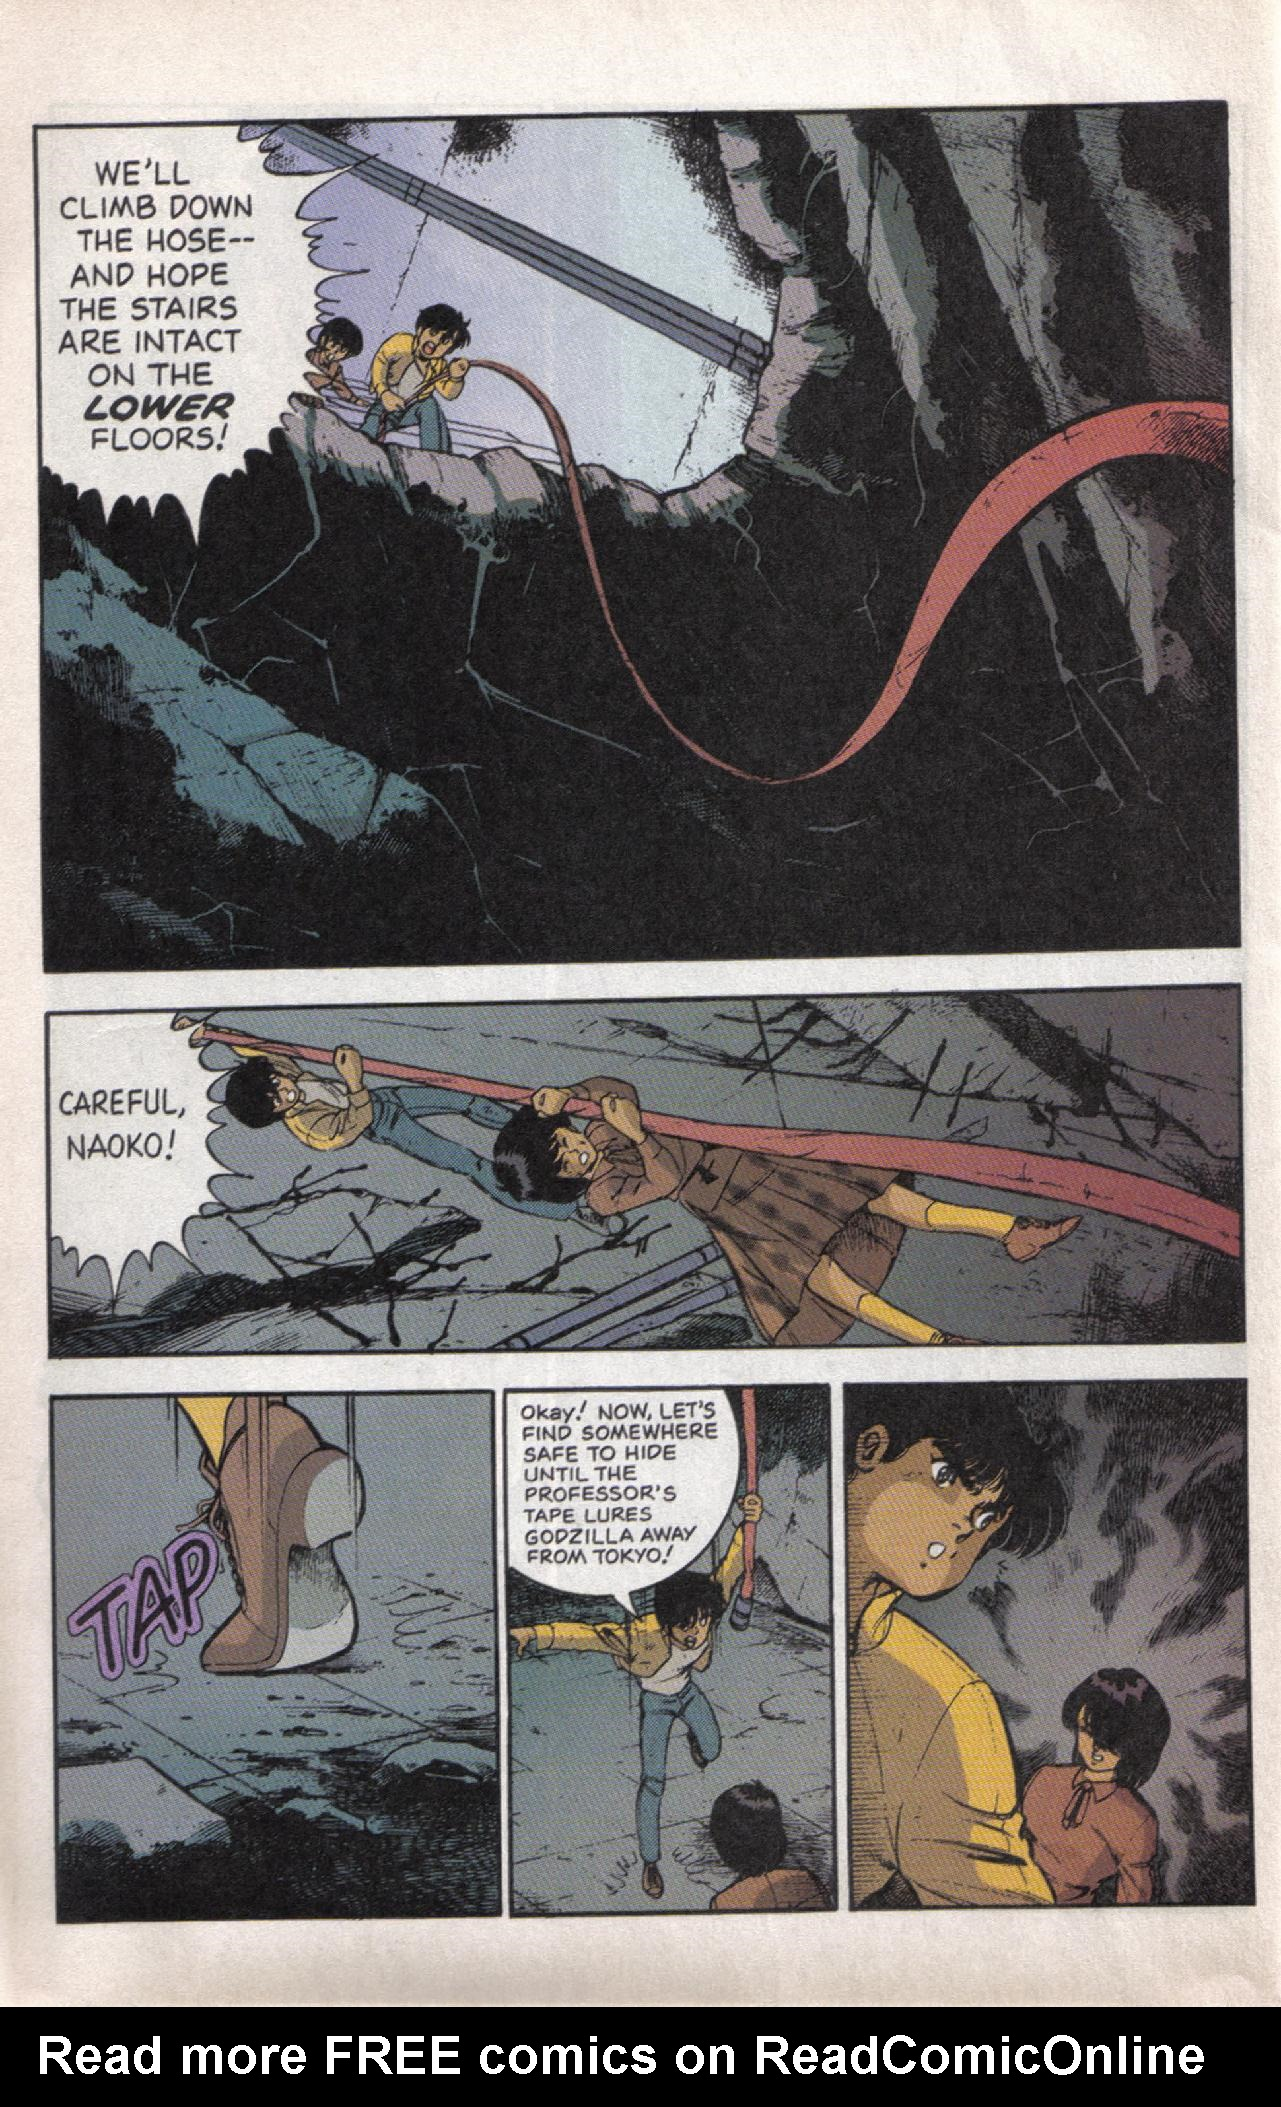 Read online Dark Horse Classics: Terror of Godzilla comic -  Issue #5 - 31